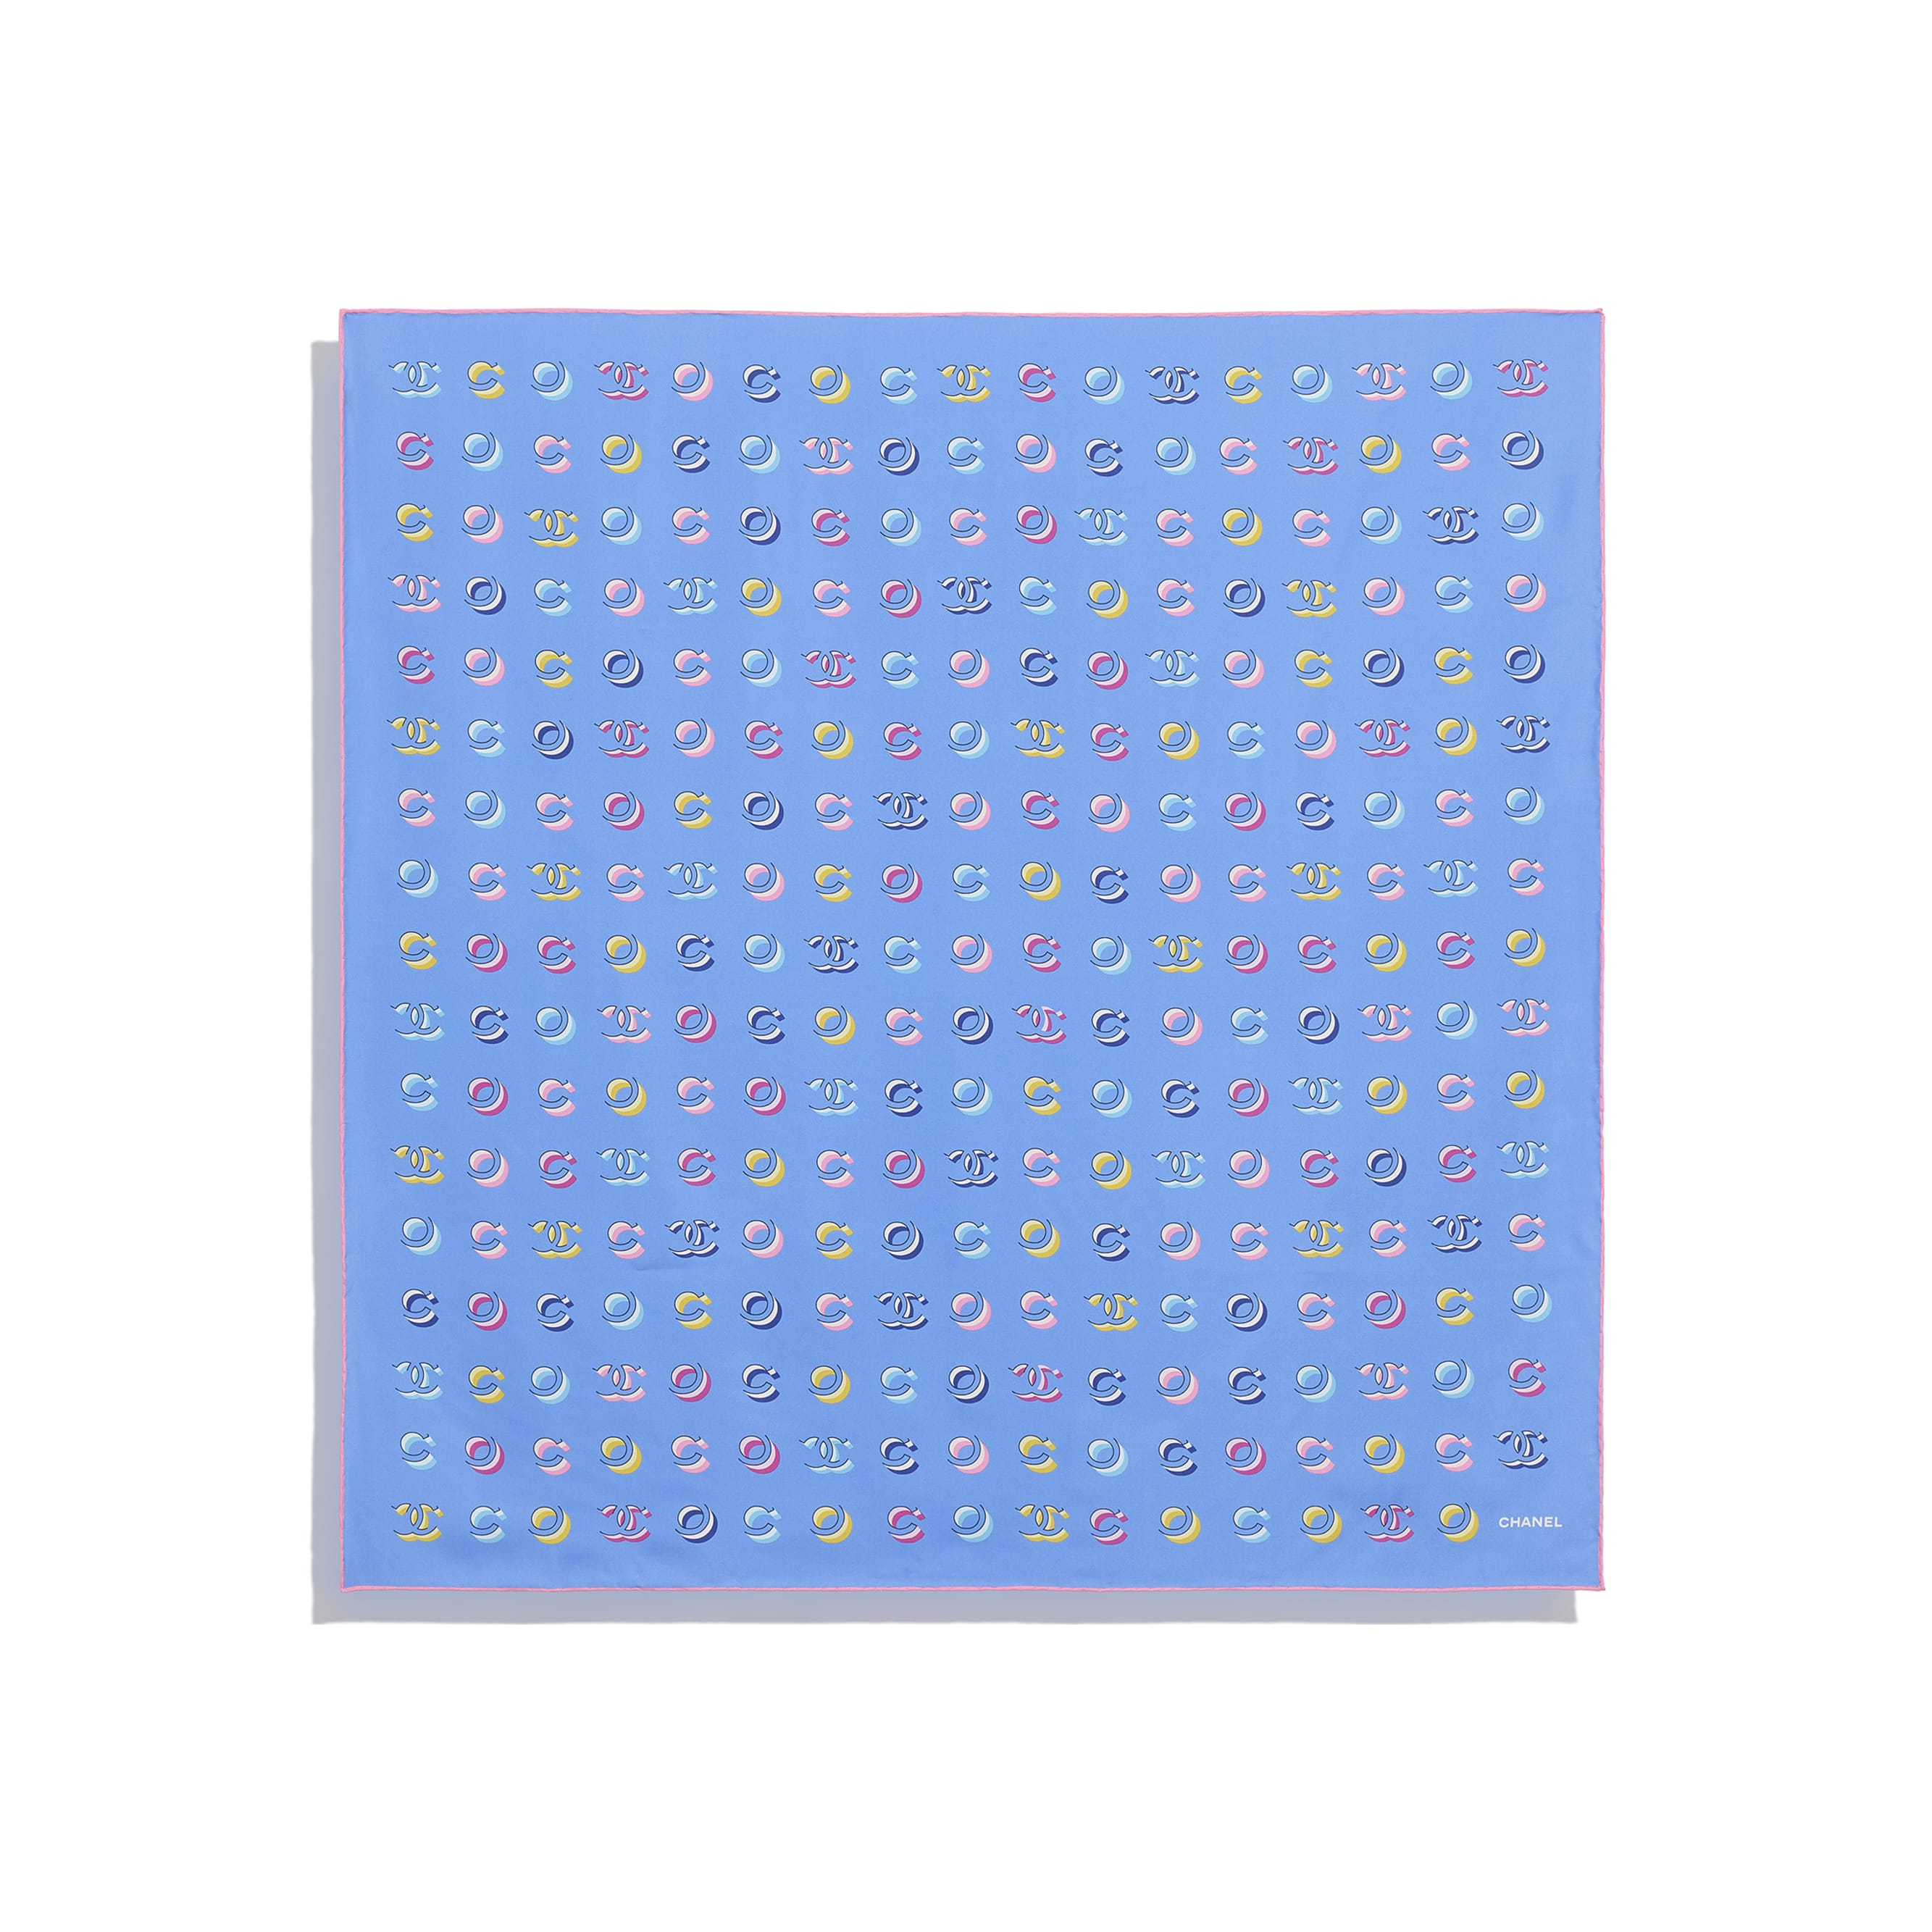 Foulard - Rosa pallido & blu - Twill di seta - CHANEL - Altra immagine - vedere versione standard